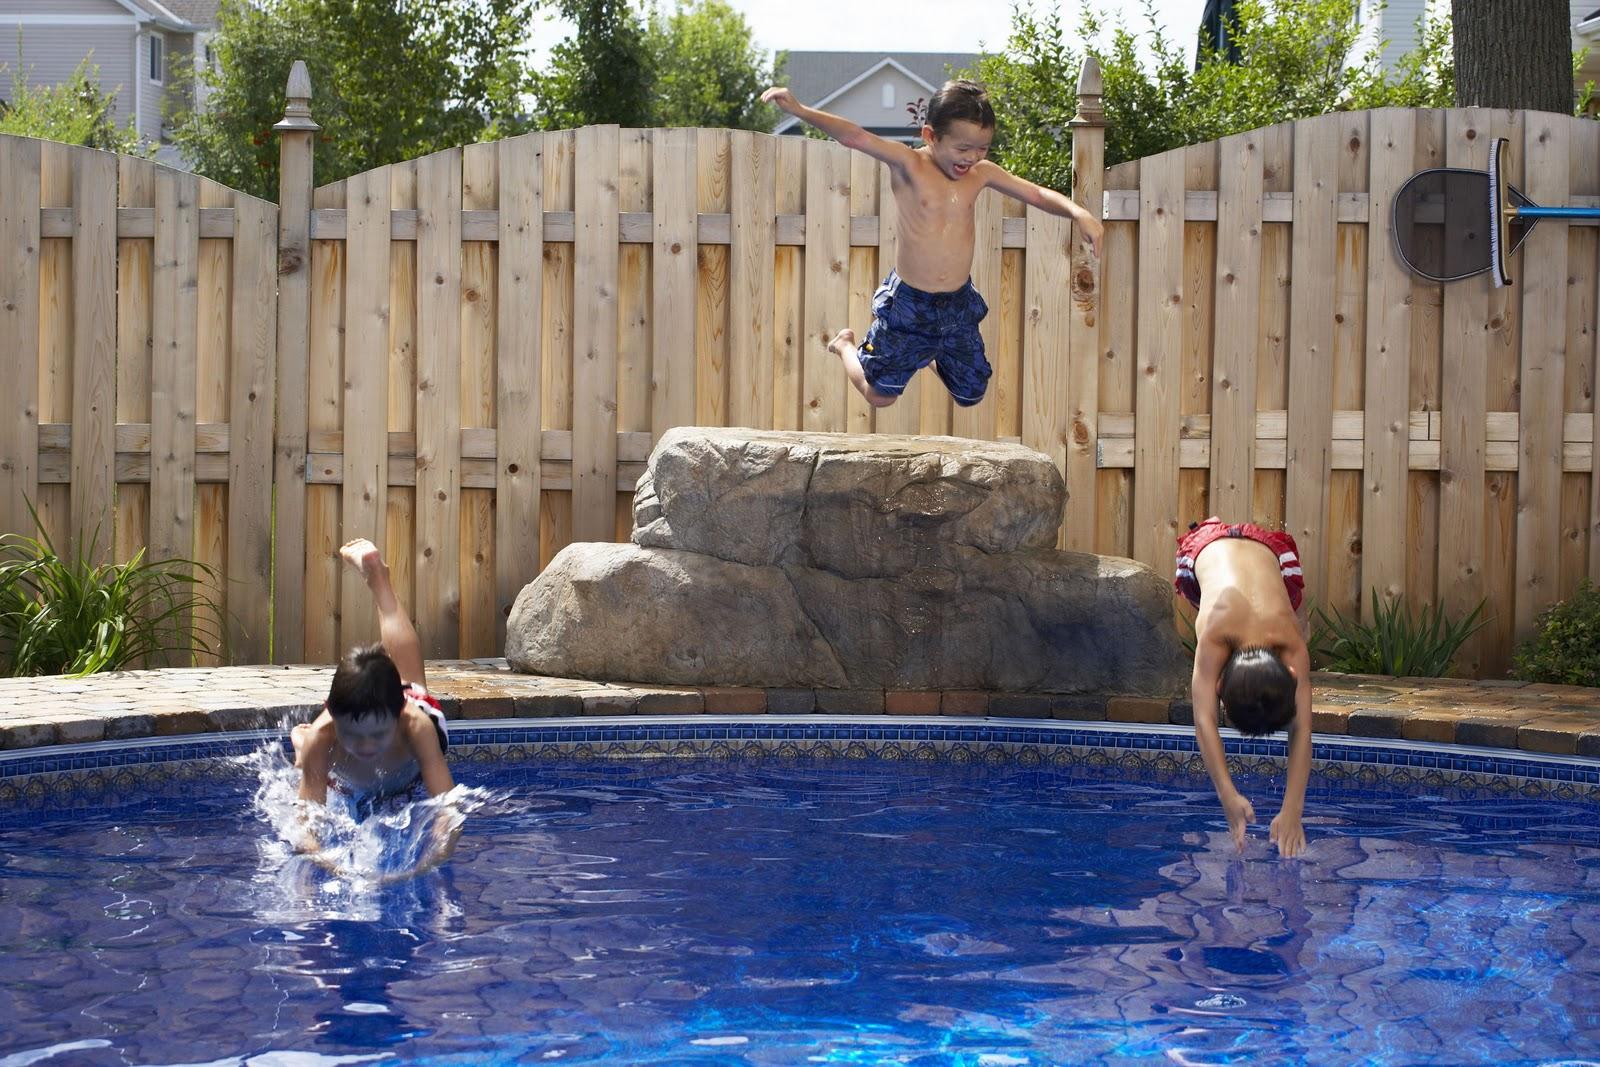 fort wayne pools sterling swimming pool games